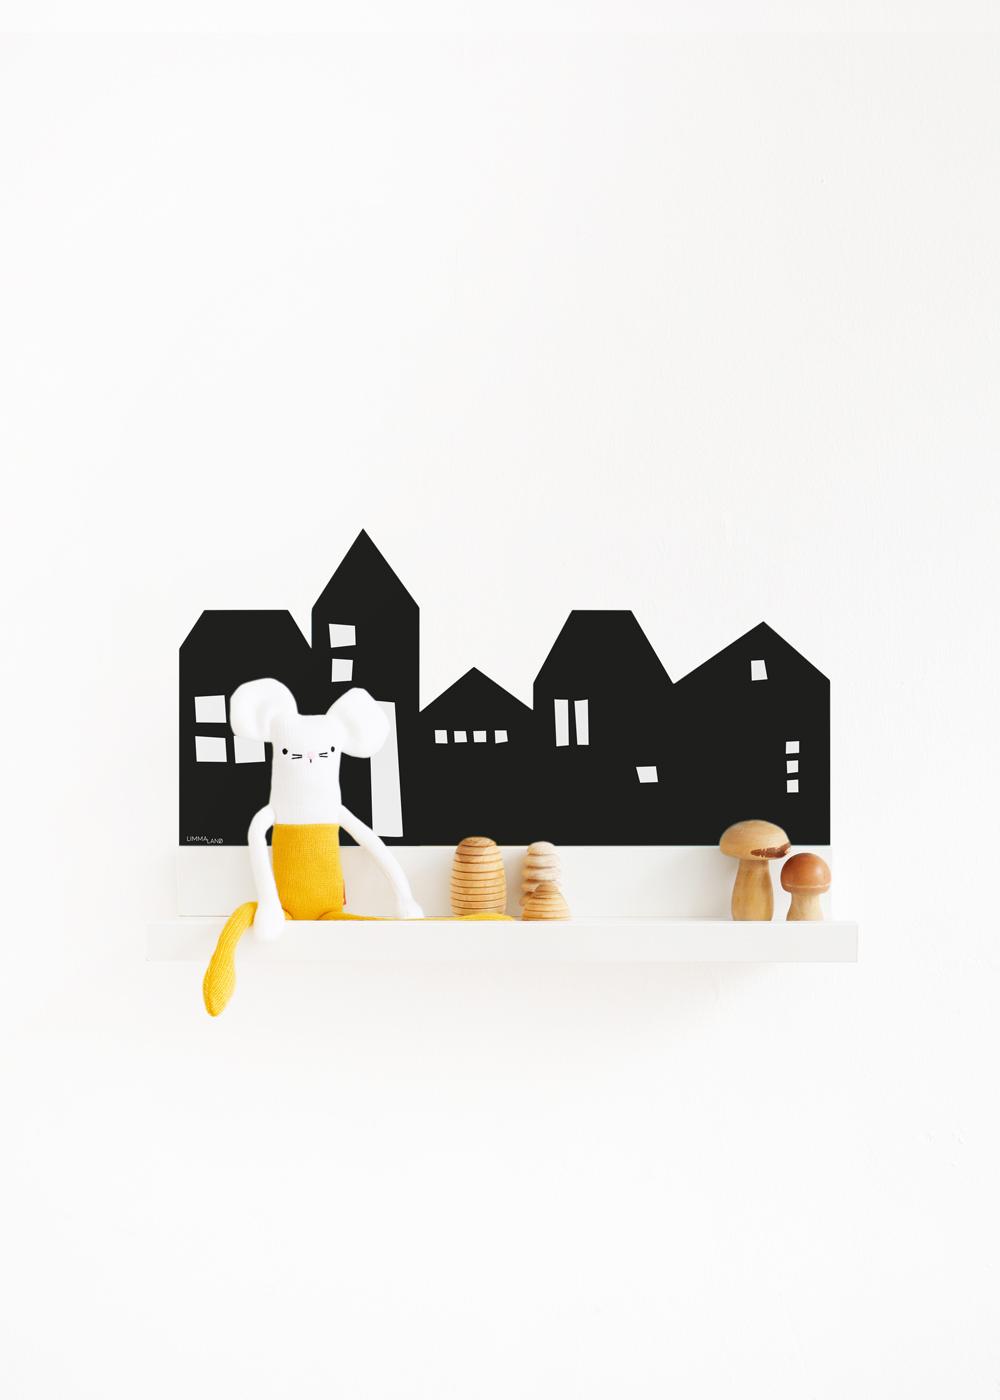 Ikea Mosslanda Bilderleiste Lille Hus schwarz